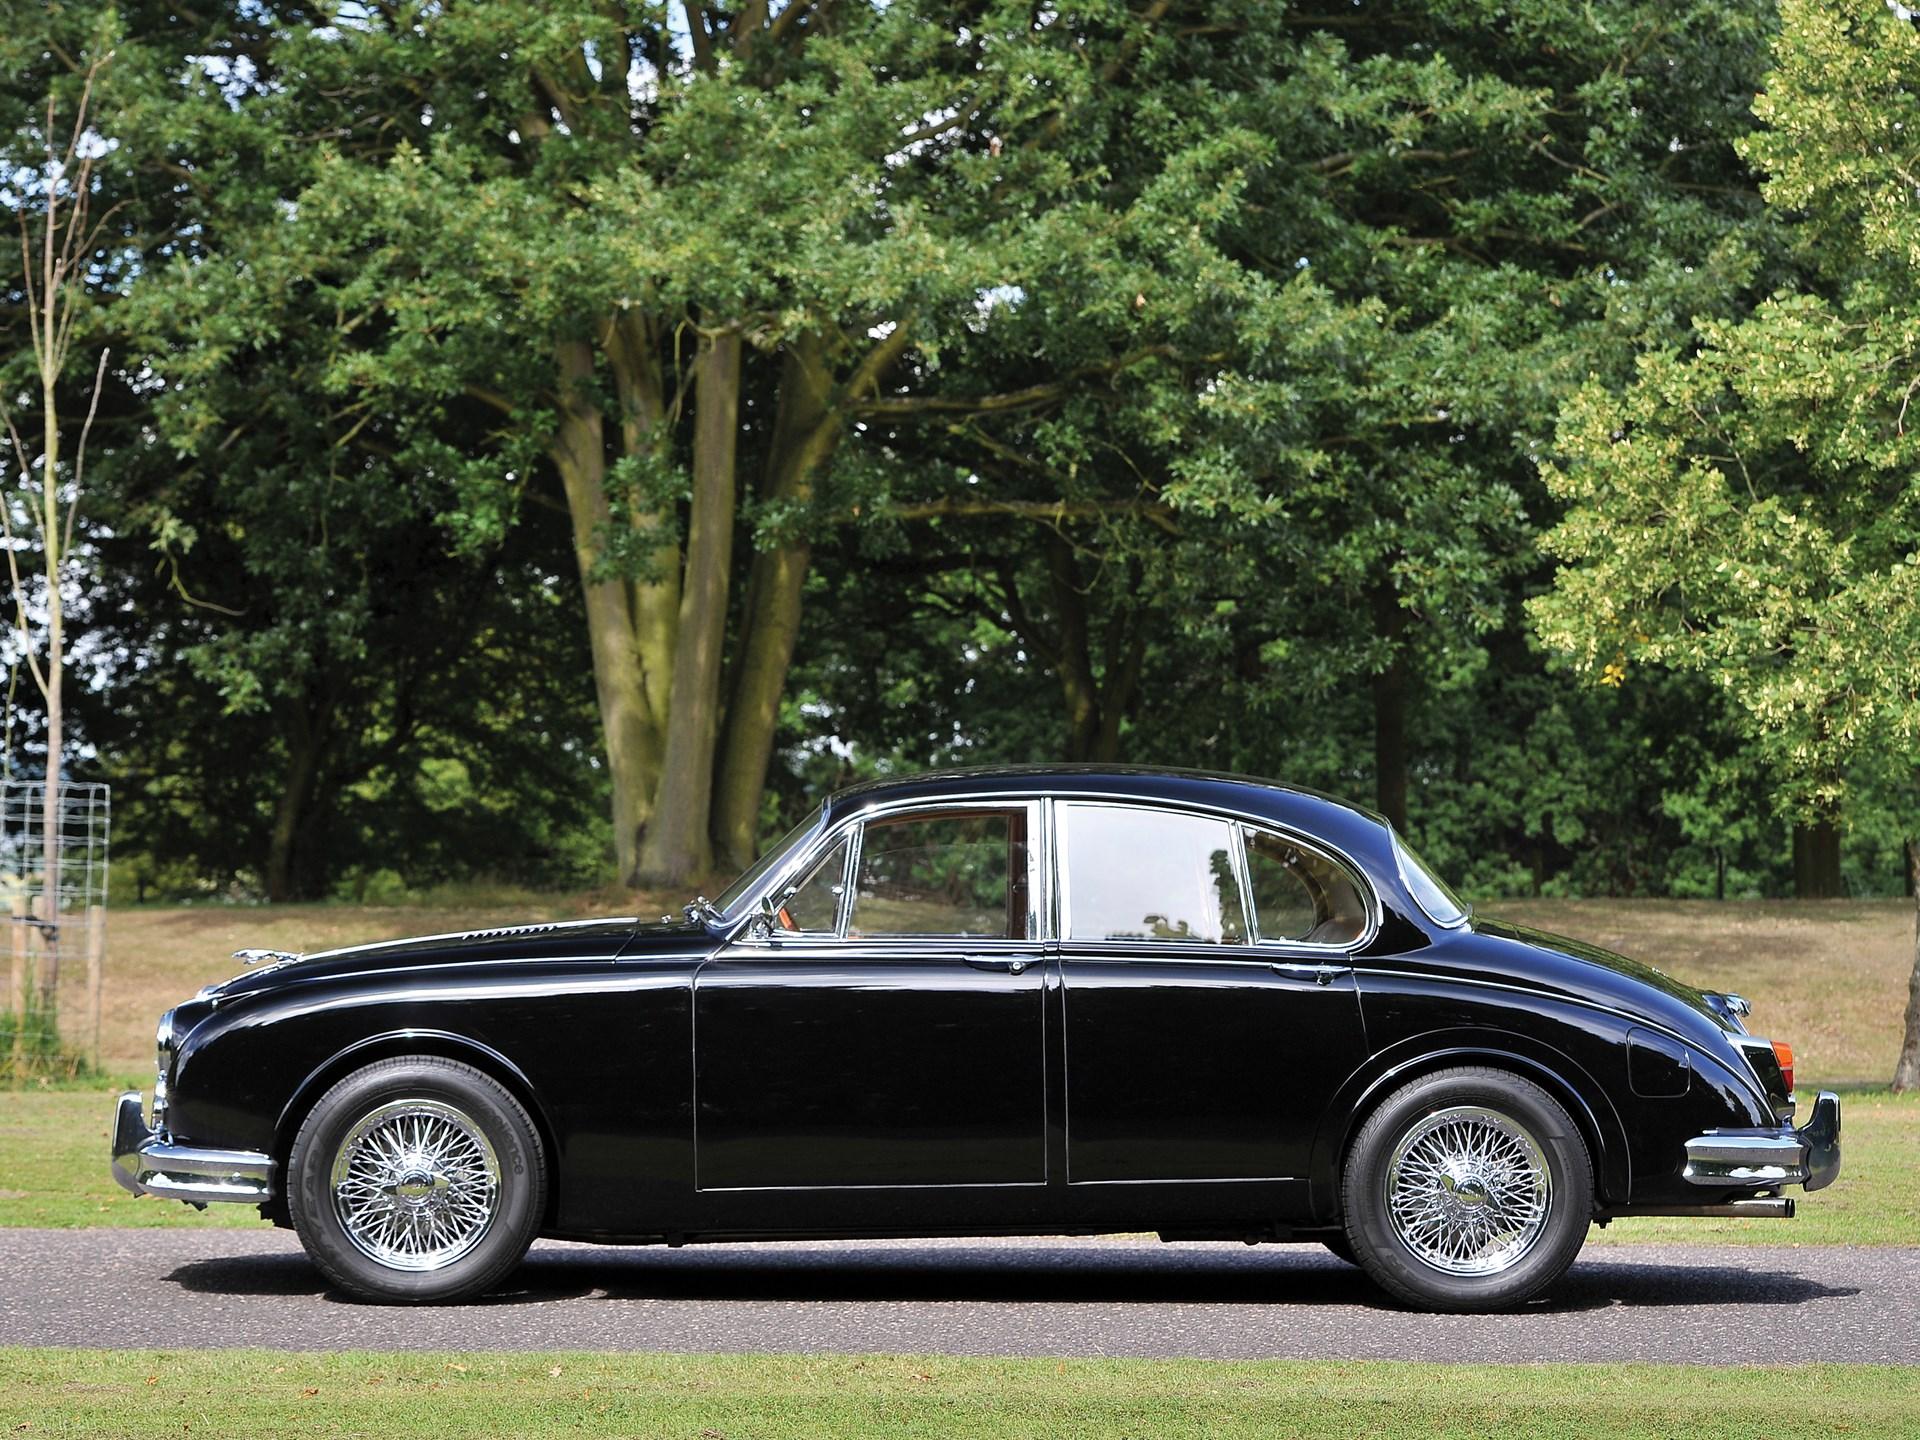 RM Sotheby's - 1961 Jaguar Mark 2 4.2 Saloon | London 2014